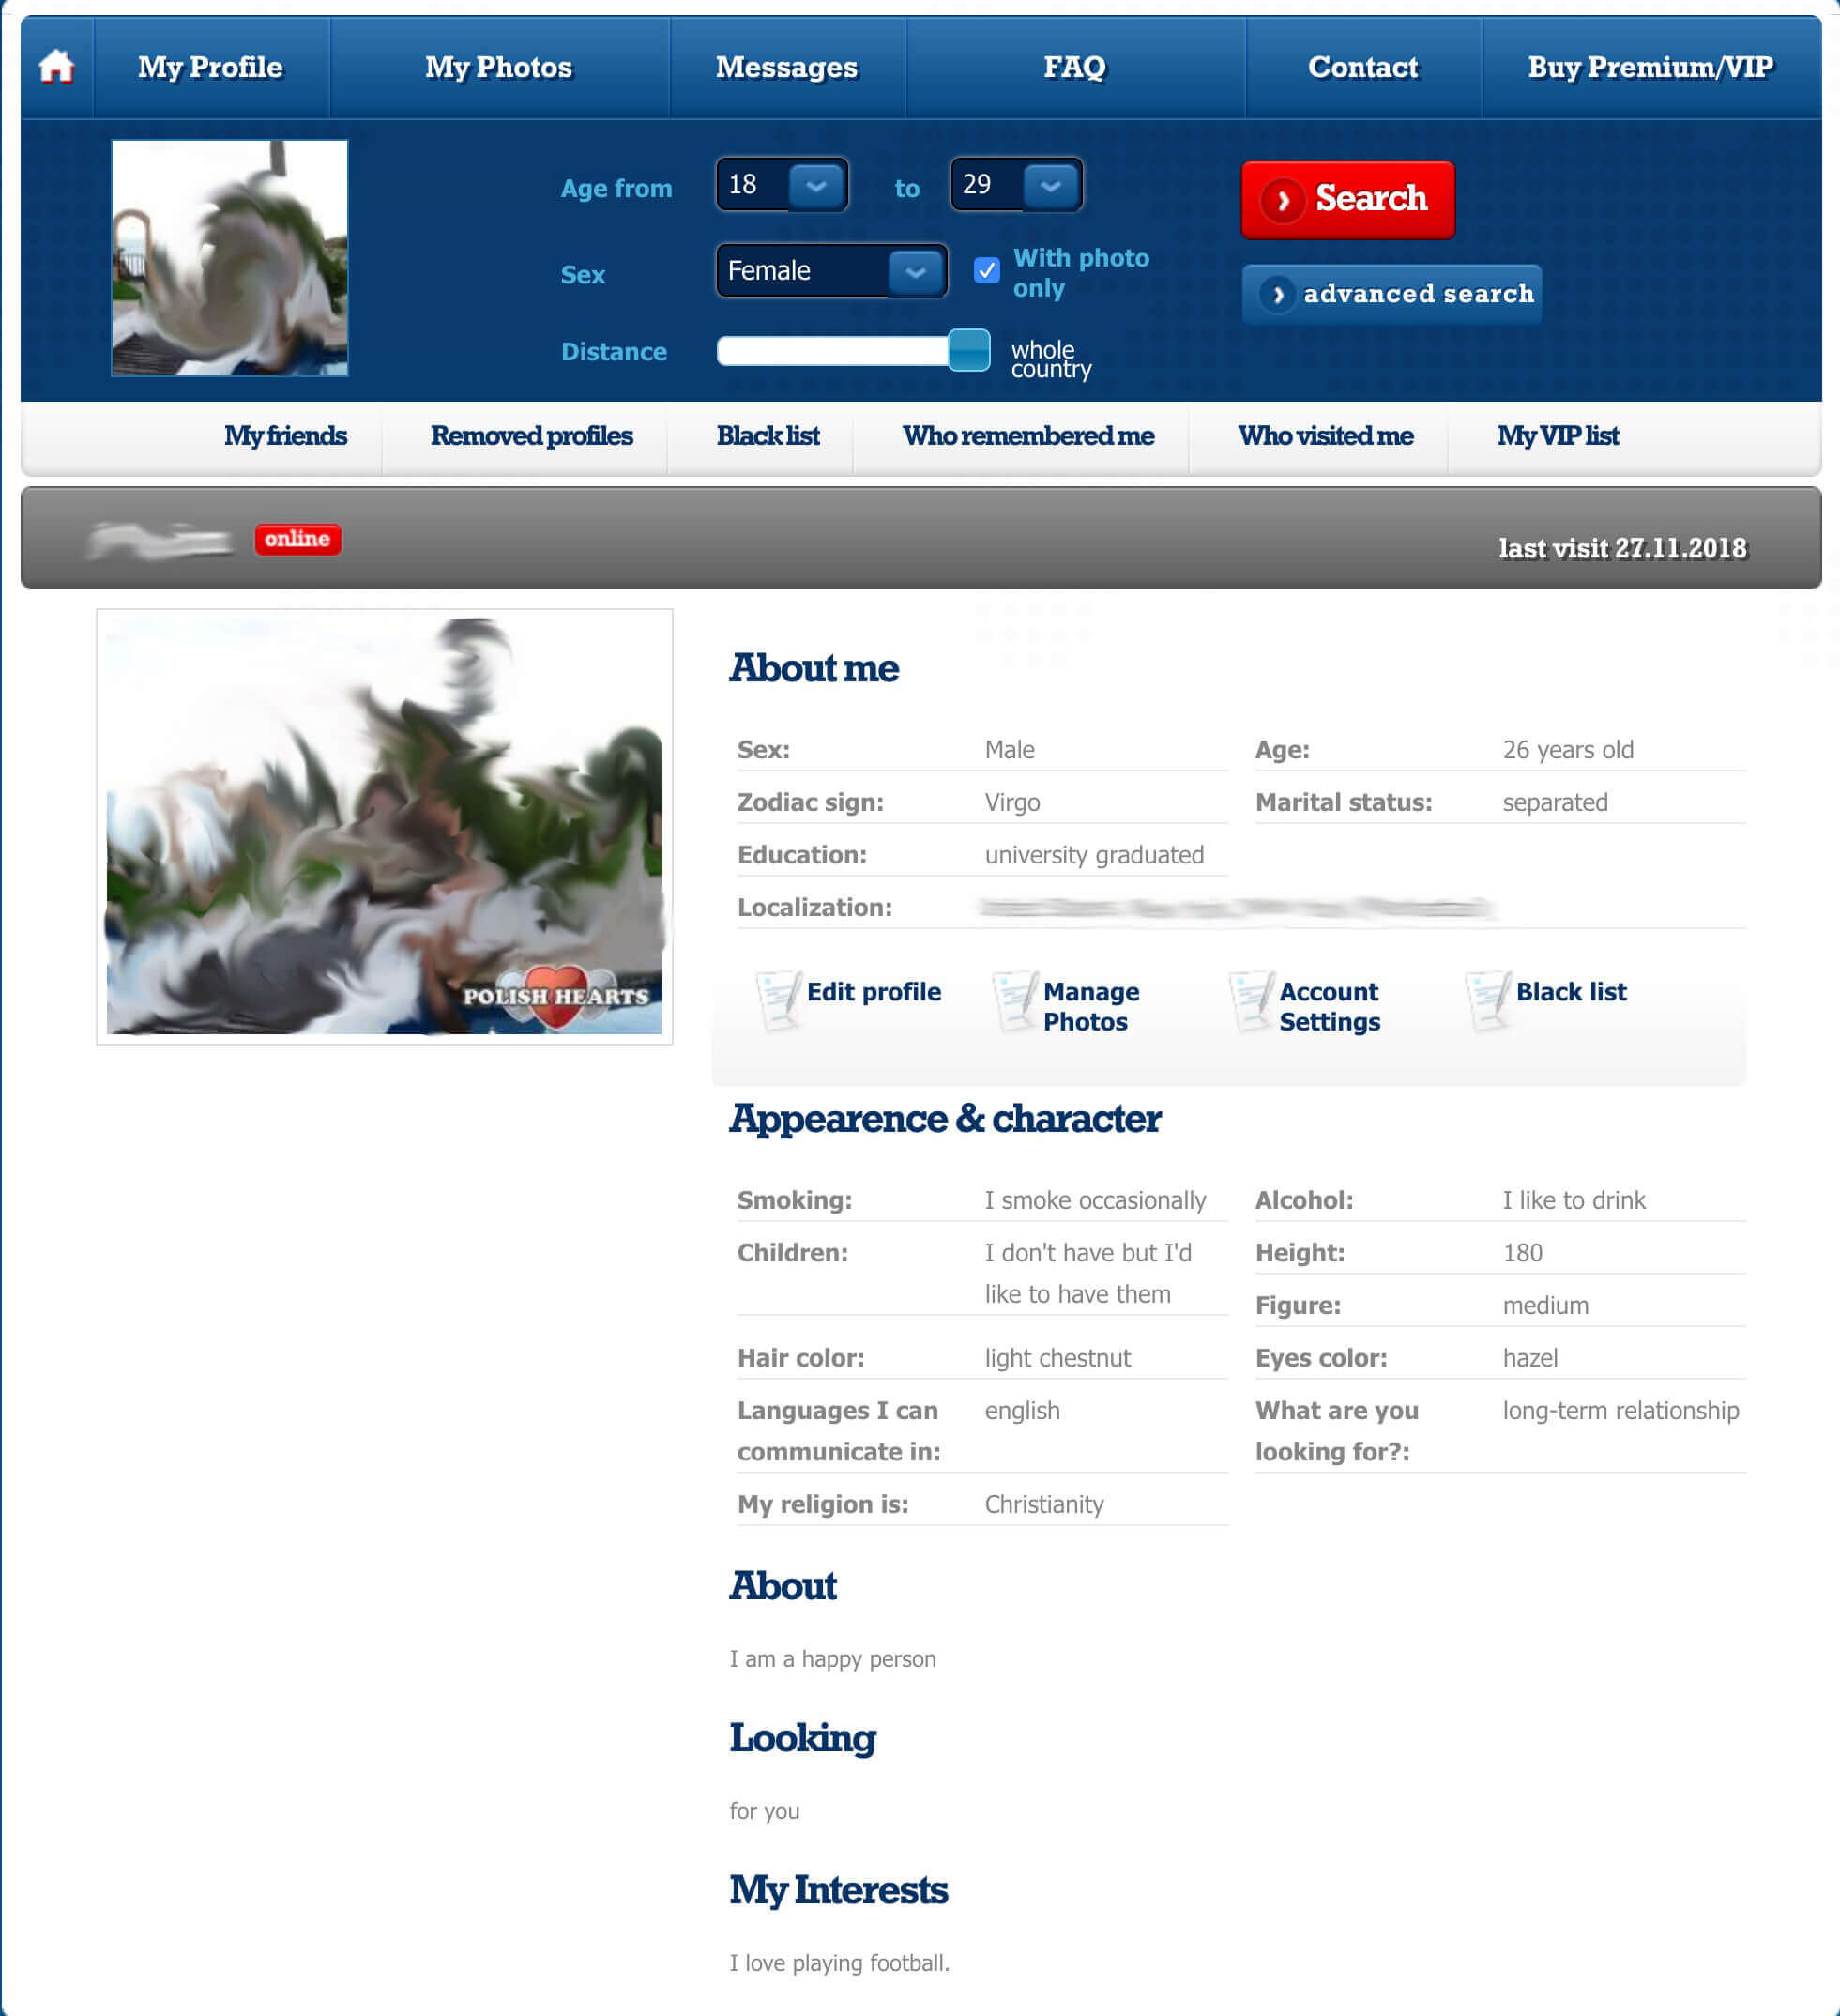 Polish Hearts Profile